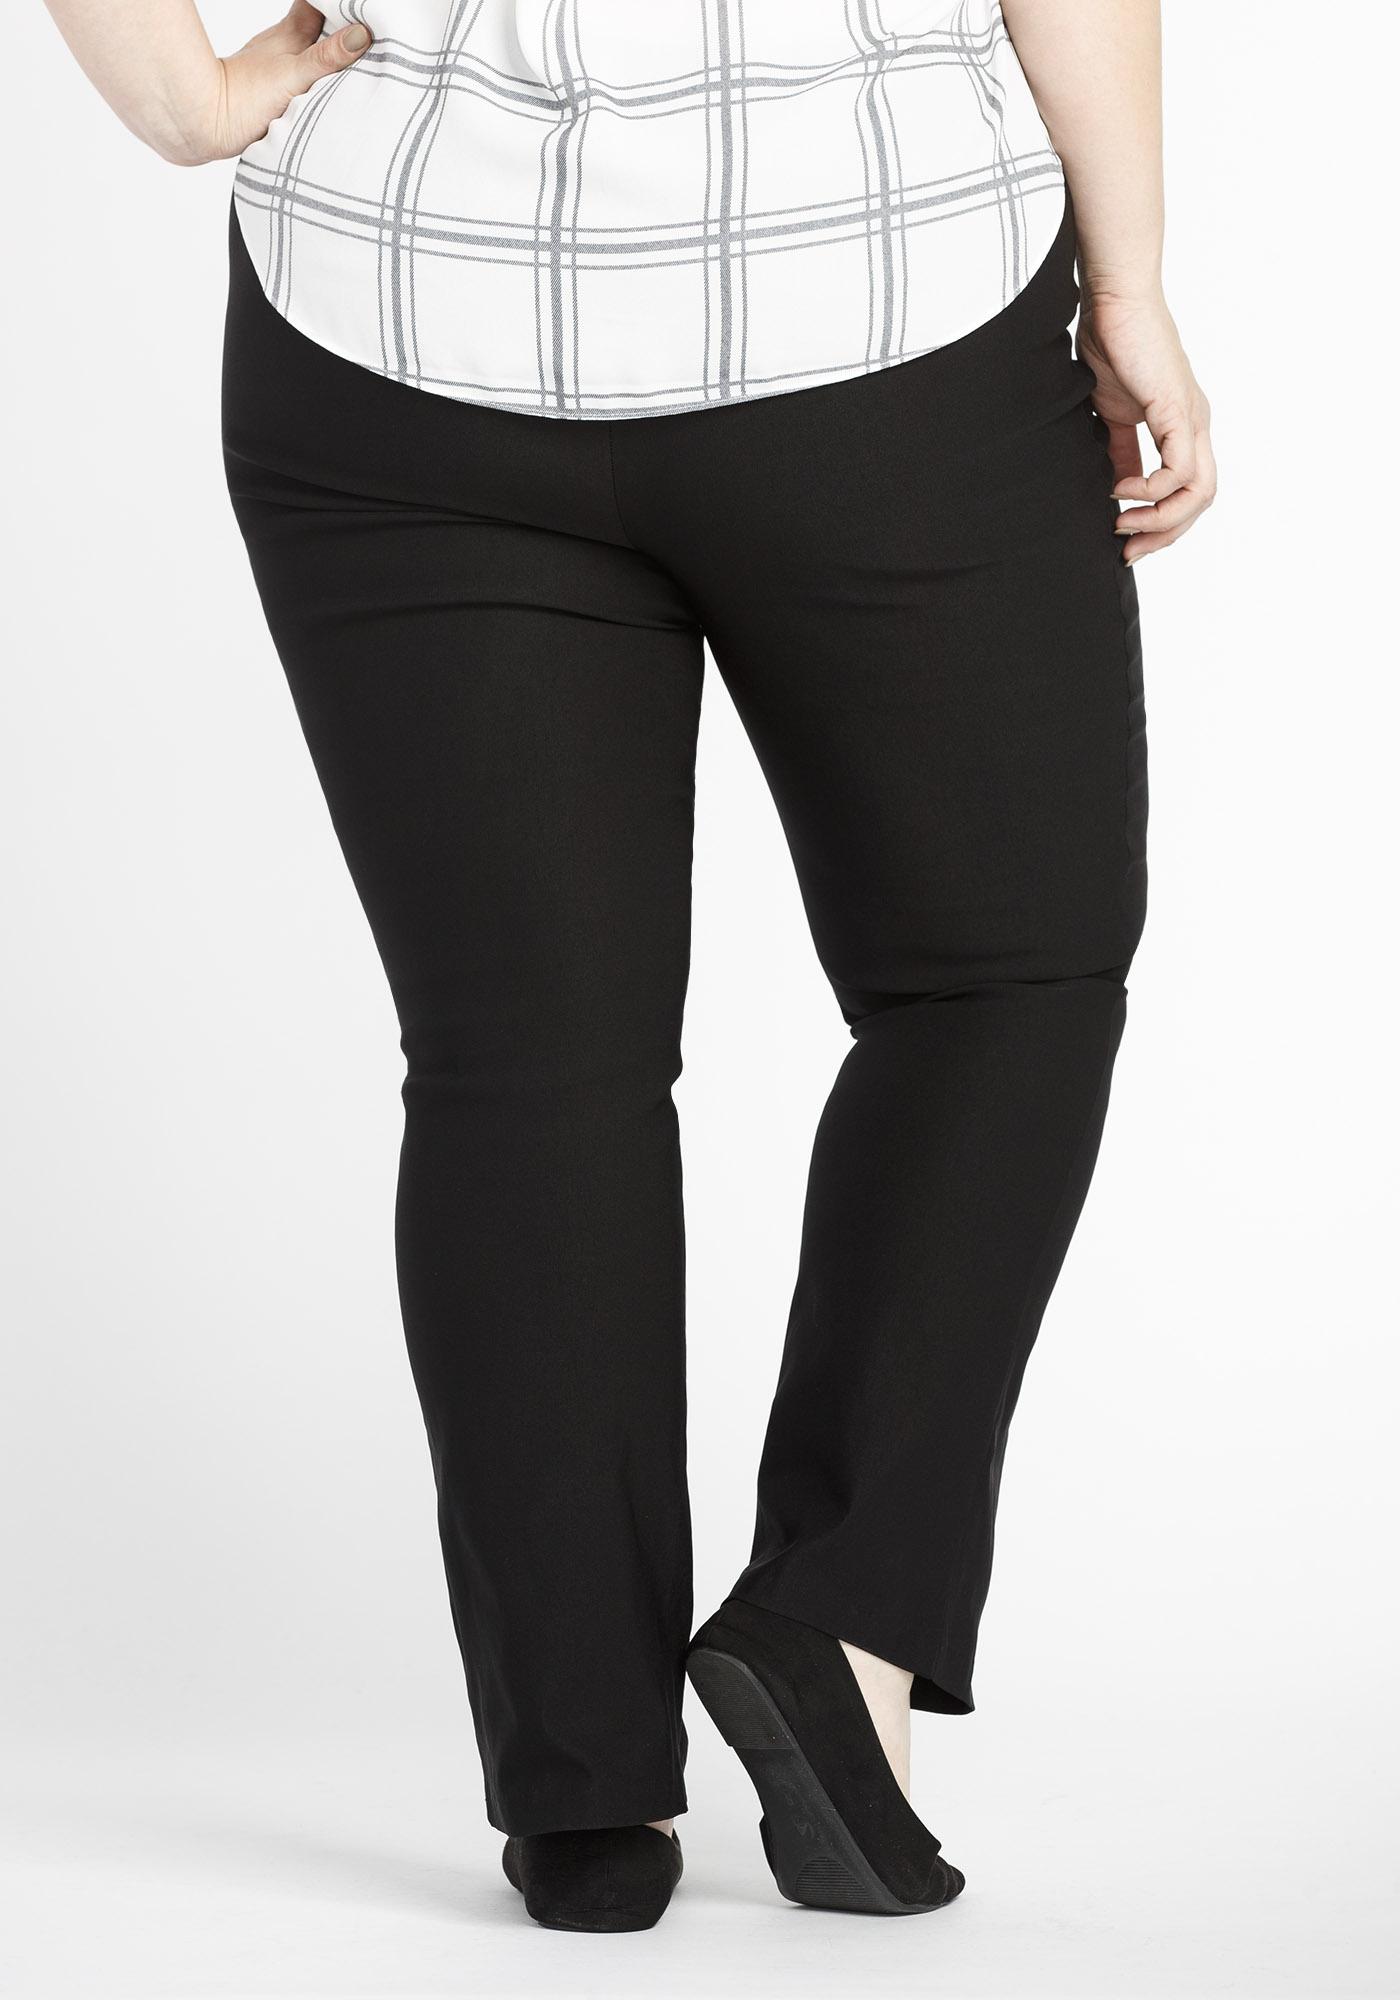 Plus Size Dress Pants – Fashion dresses